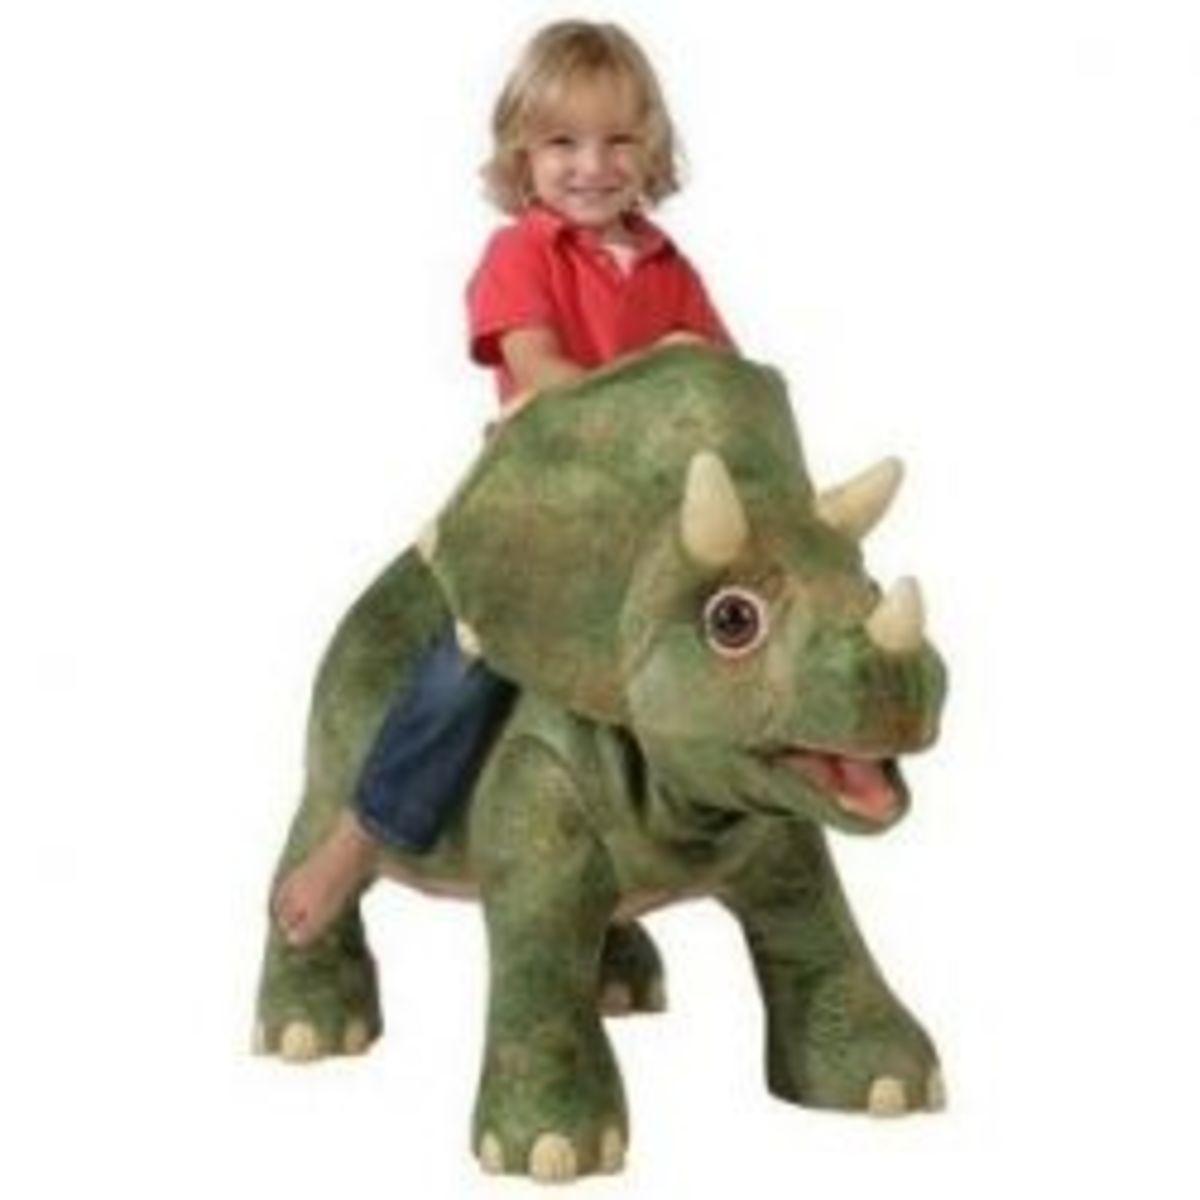 Top 10 Dinosaur Toys